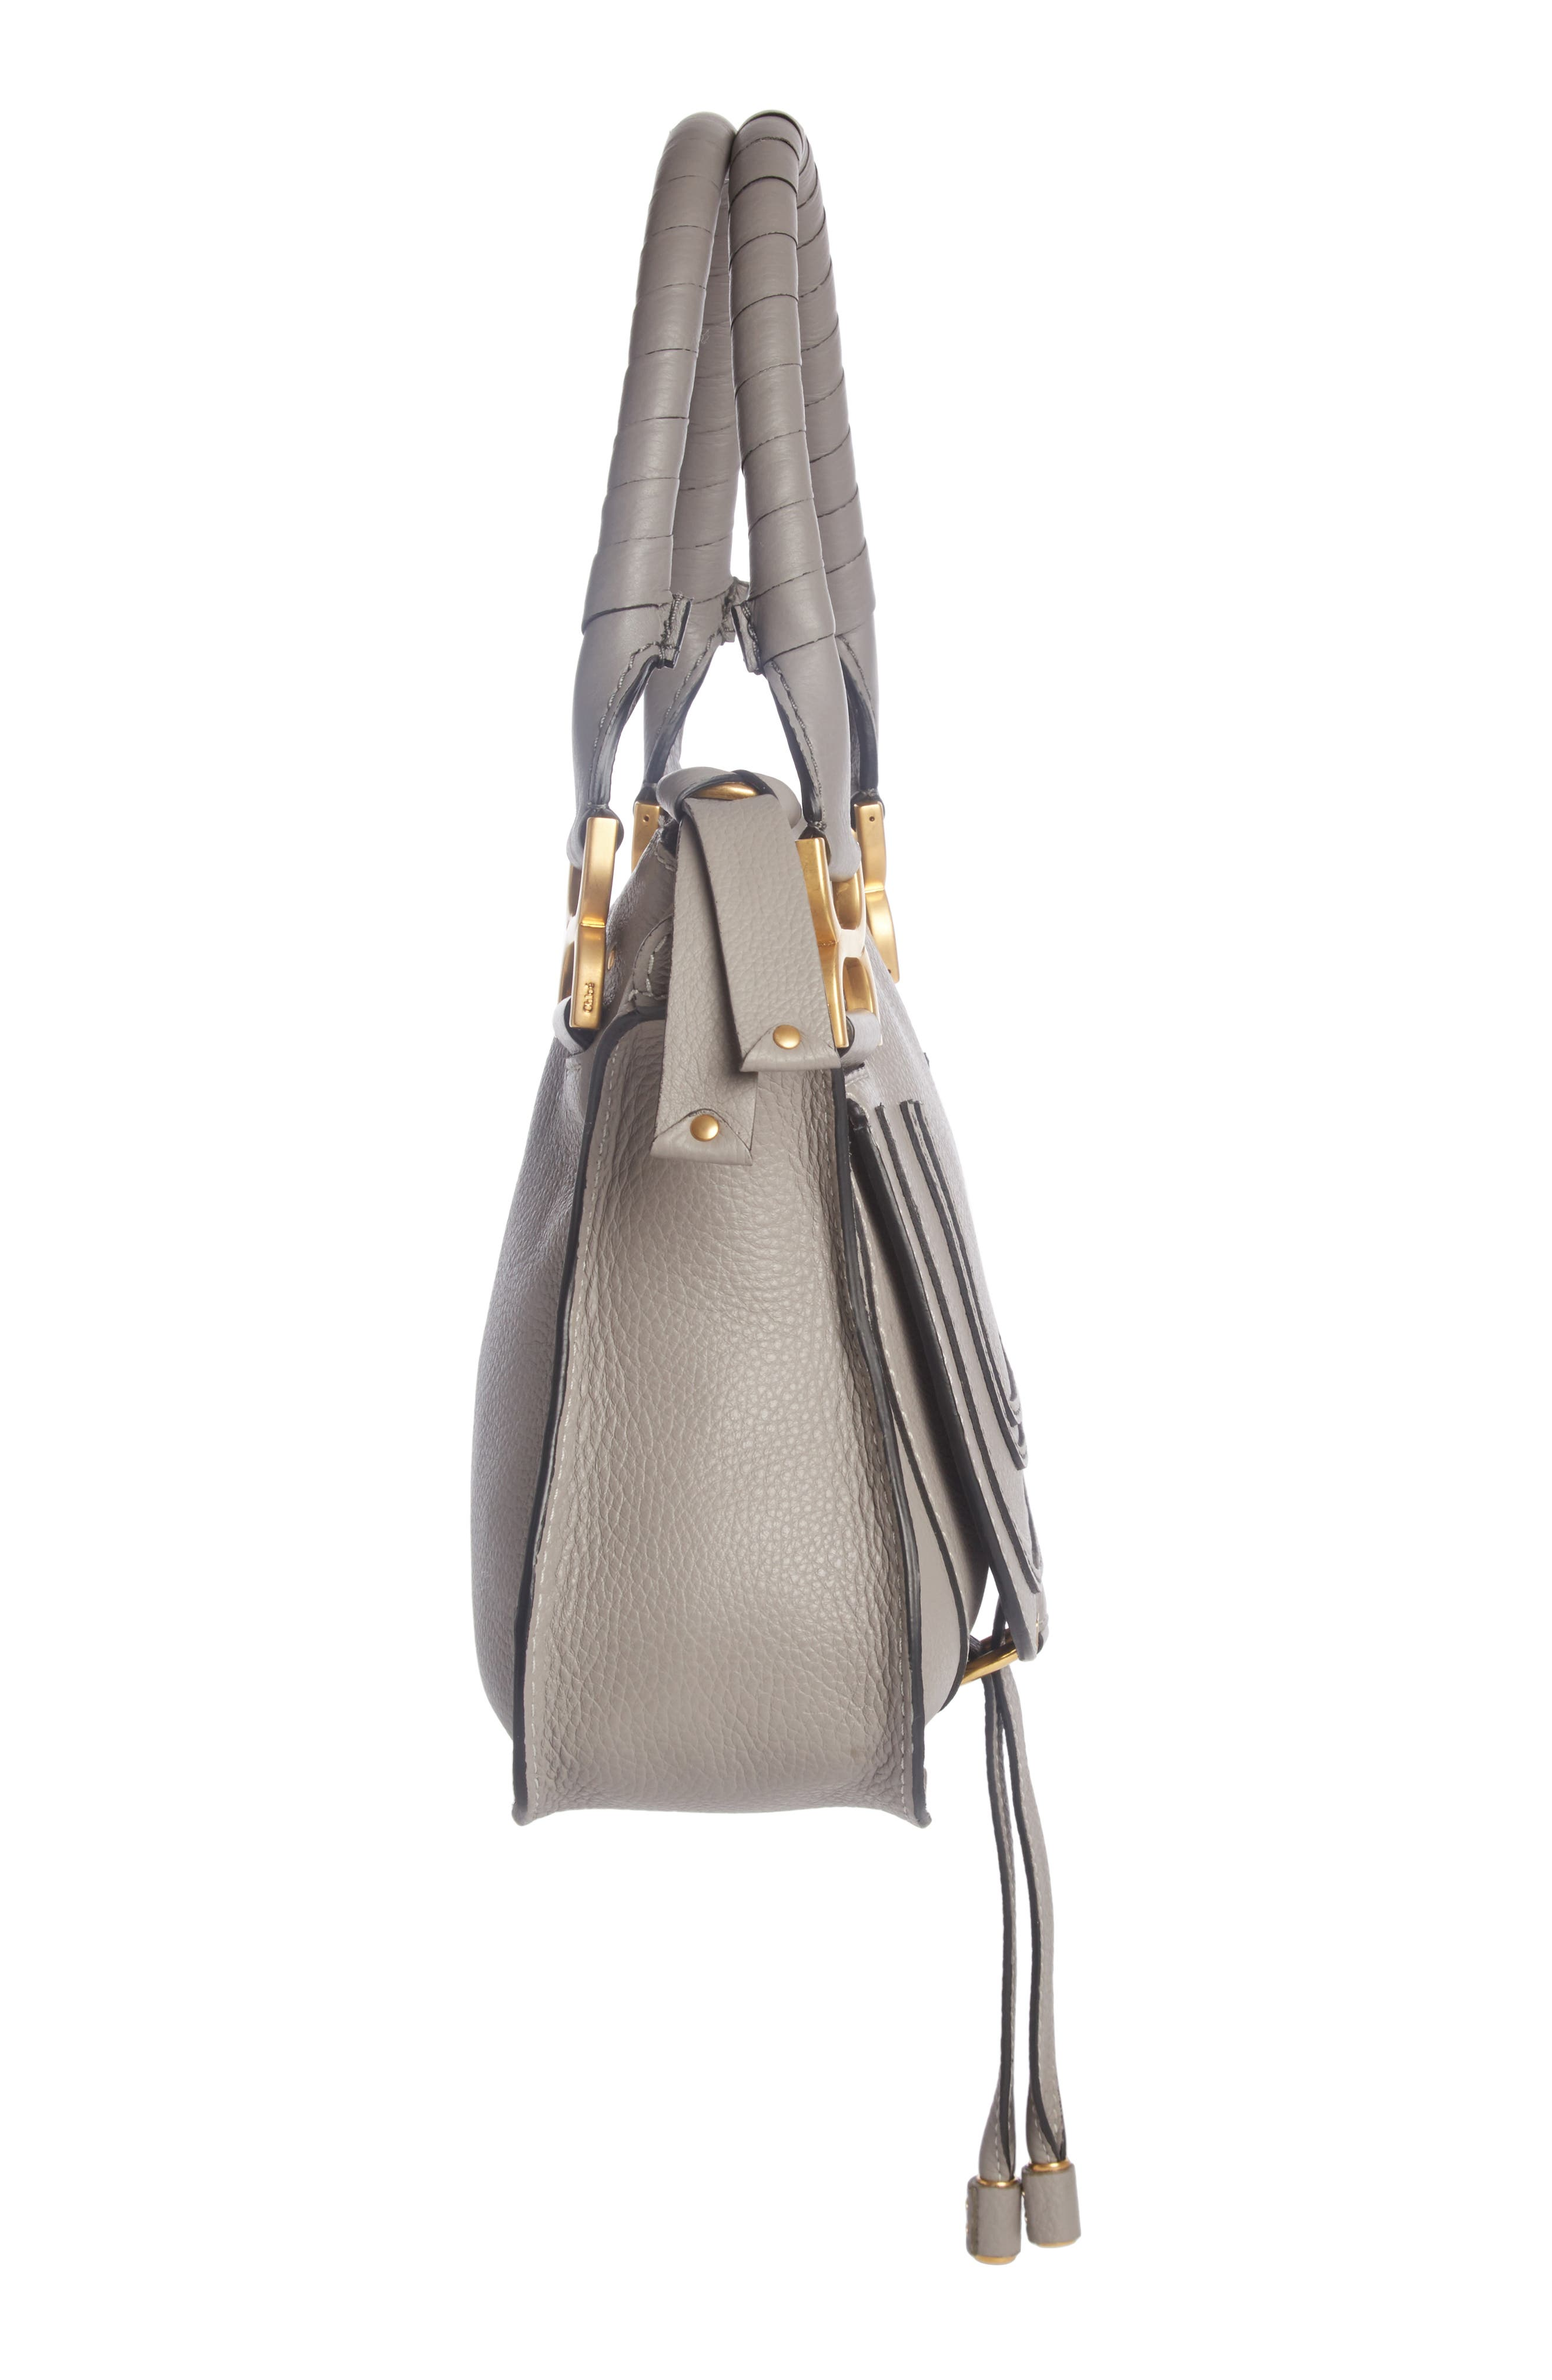 CHLOÉ, Marcie Small Double Carry Bag, Alternate thumbnail 4, color, CASHMERE GREY